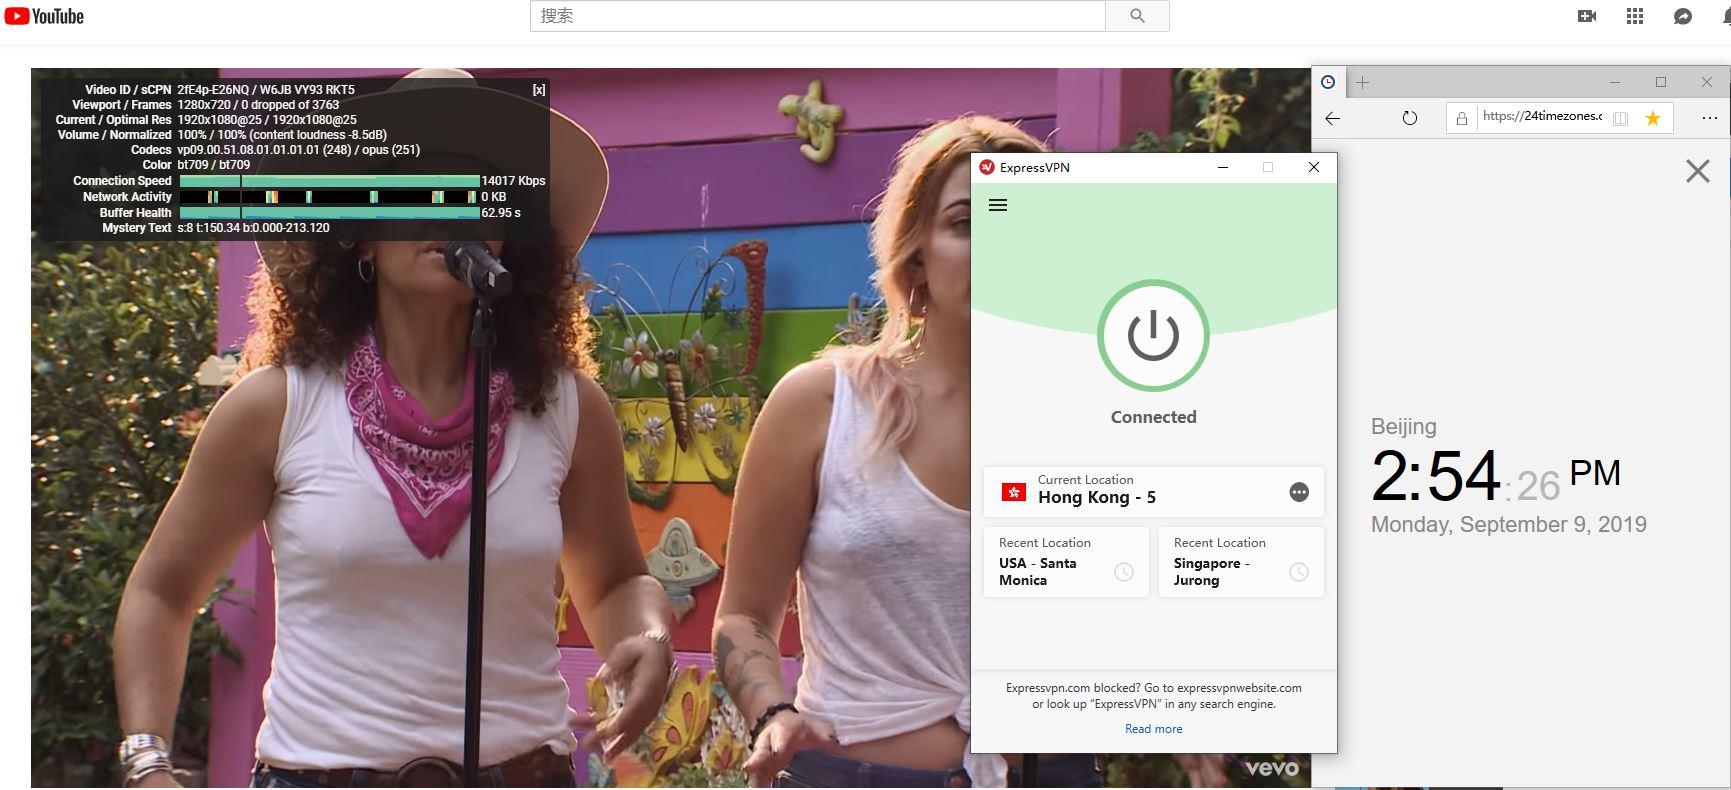 windows ExpressVPN 香港-5 服务器 中国VPN翻墙 科学上网 YouTube速度测试-20190909